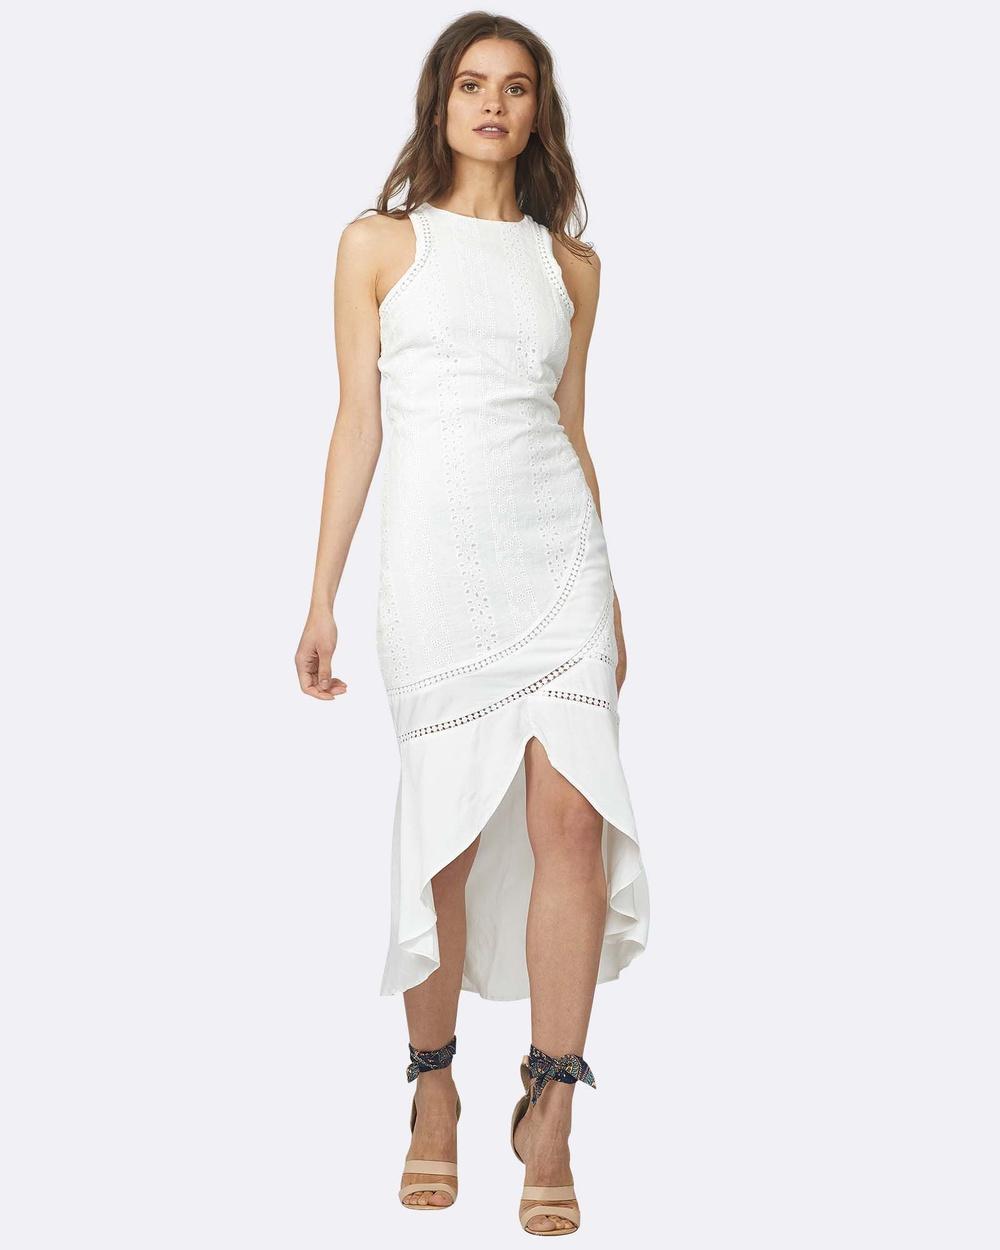 Three of Something Rhinestone Dress Dresses White Rhinestone Dress